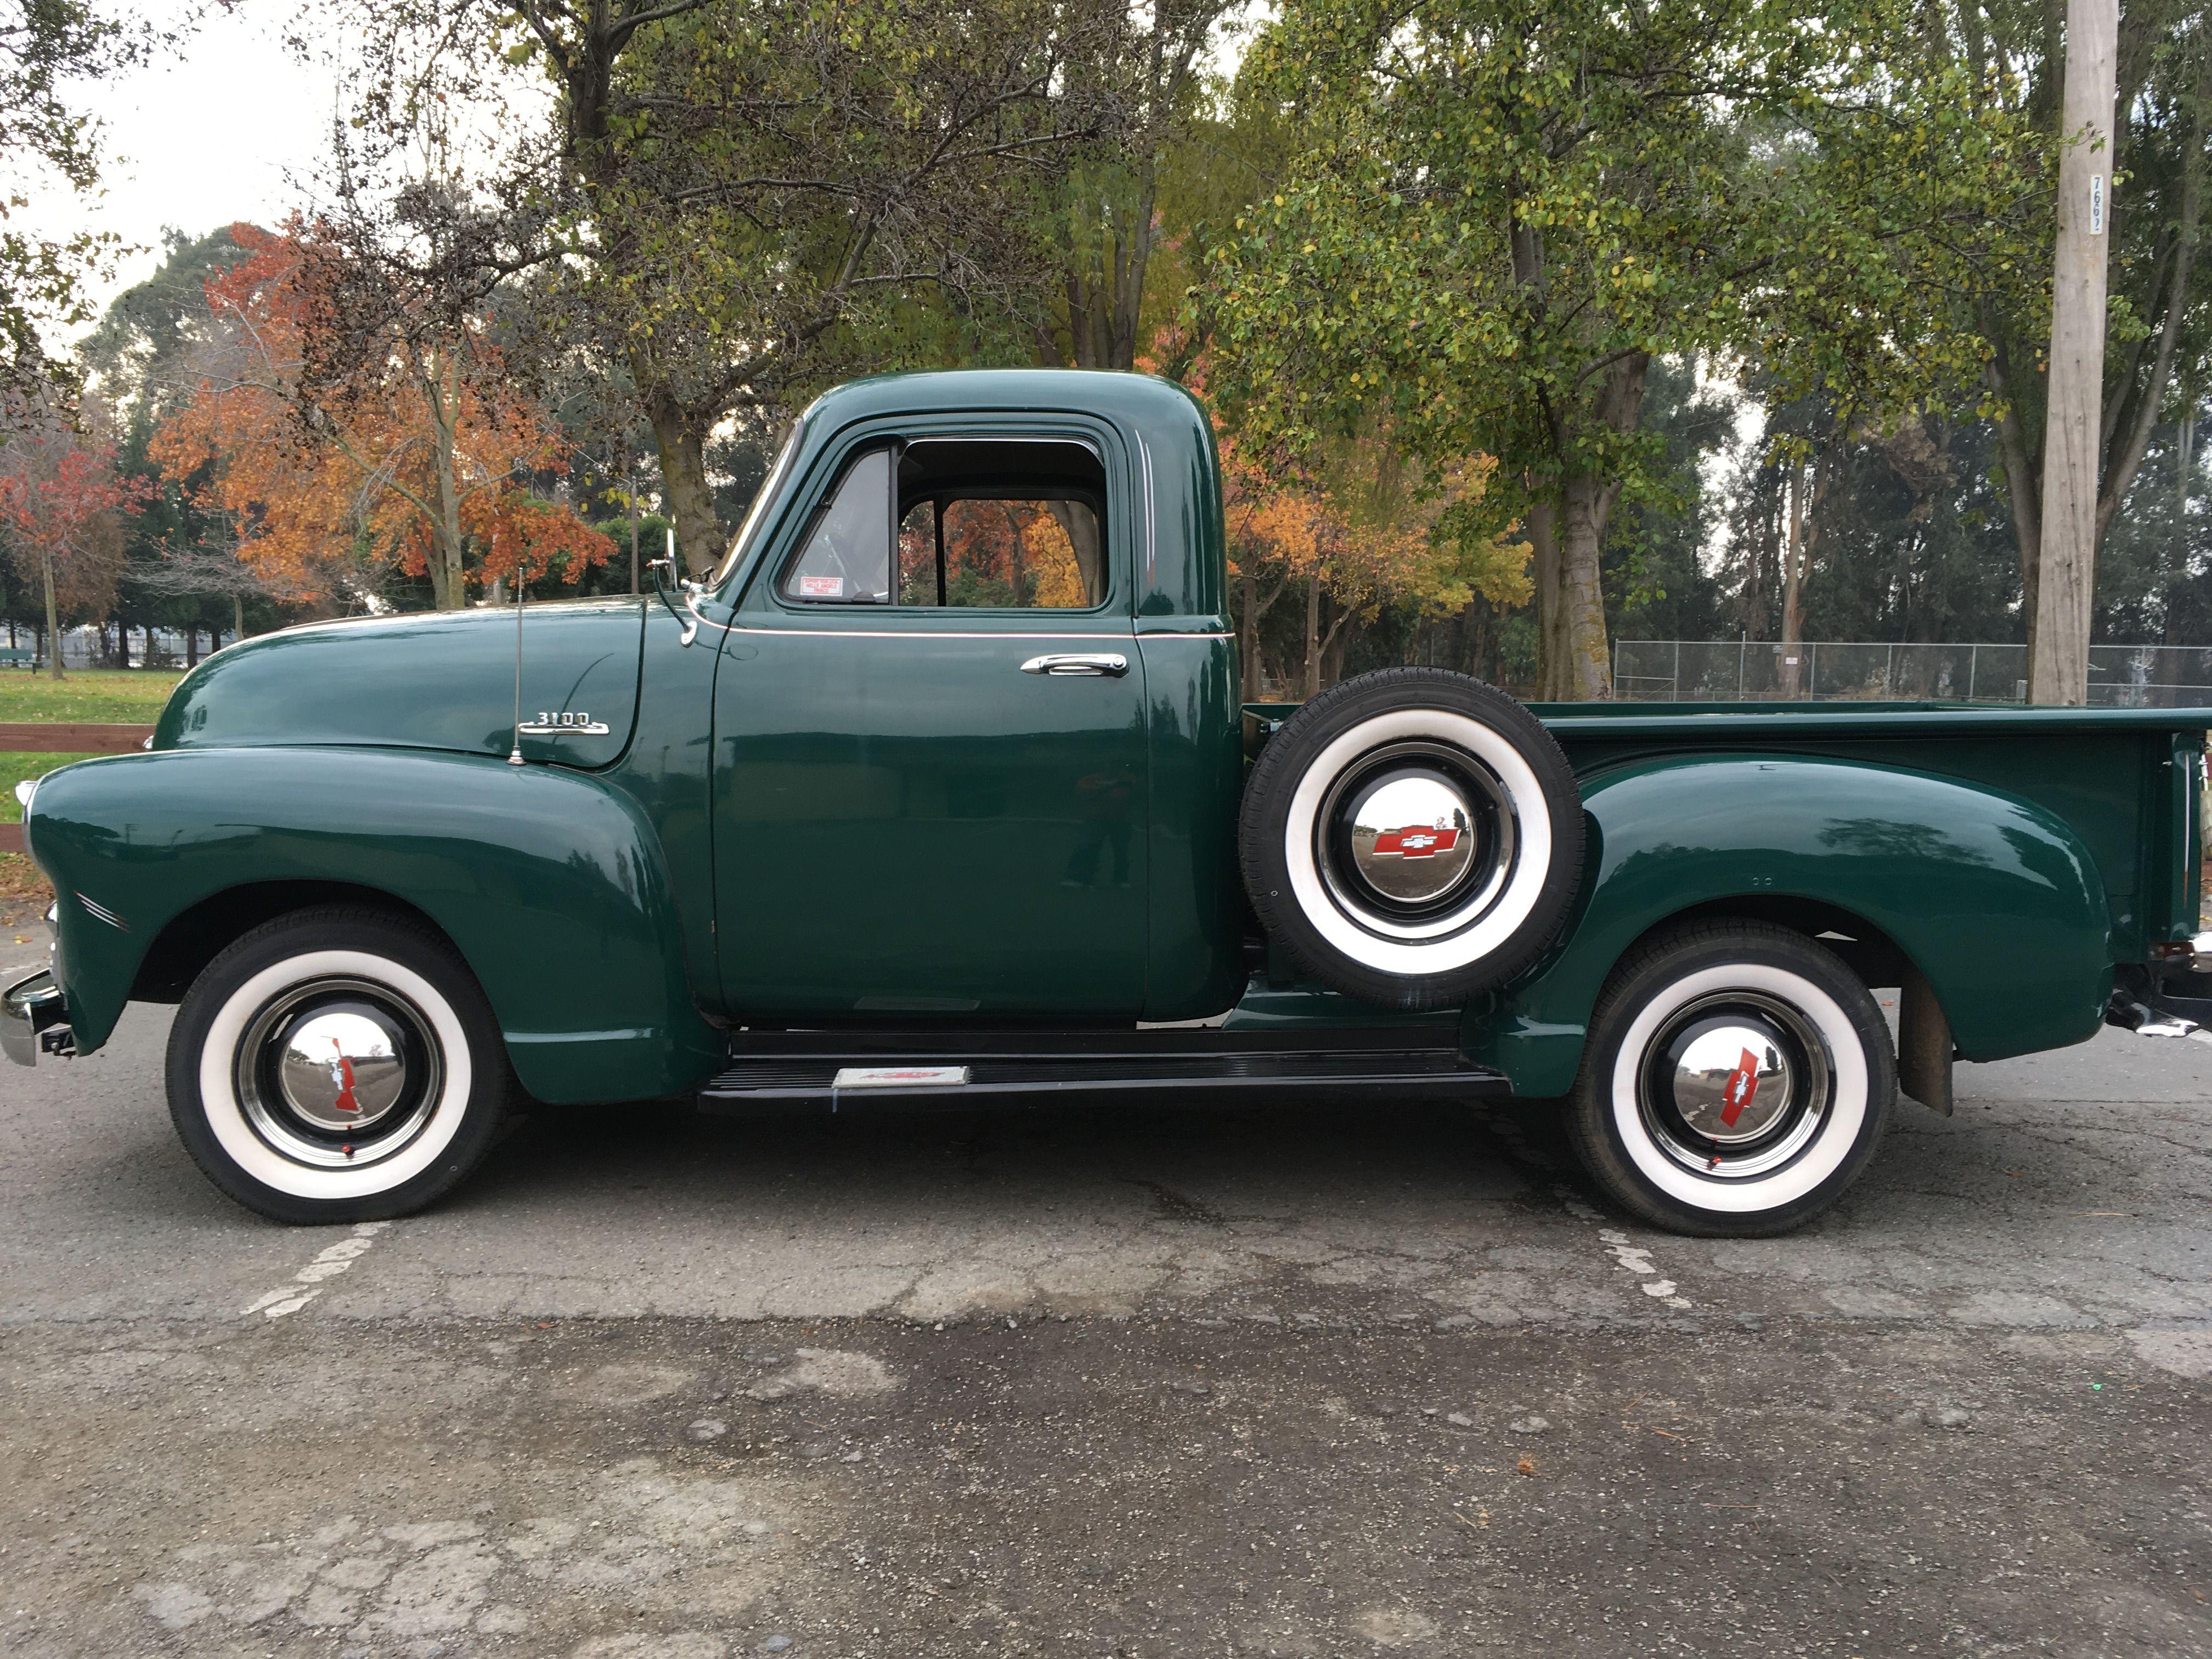 1954 Chevy Truck | Old Classics Trucks | Pinterest | 1954 chevy ...